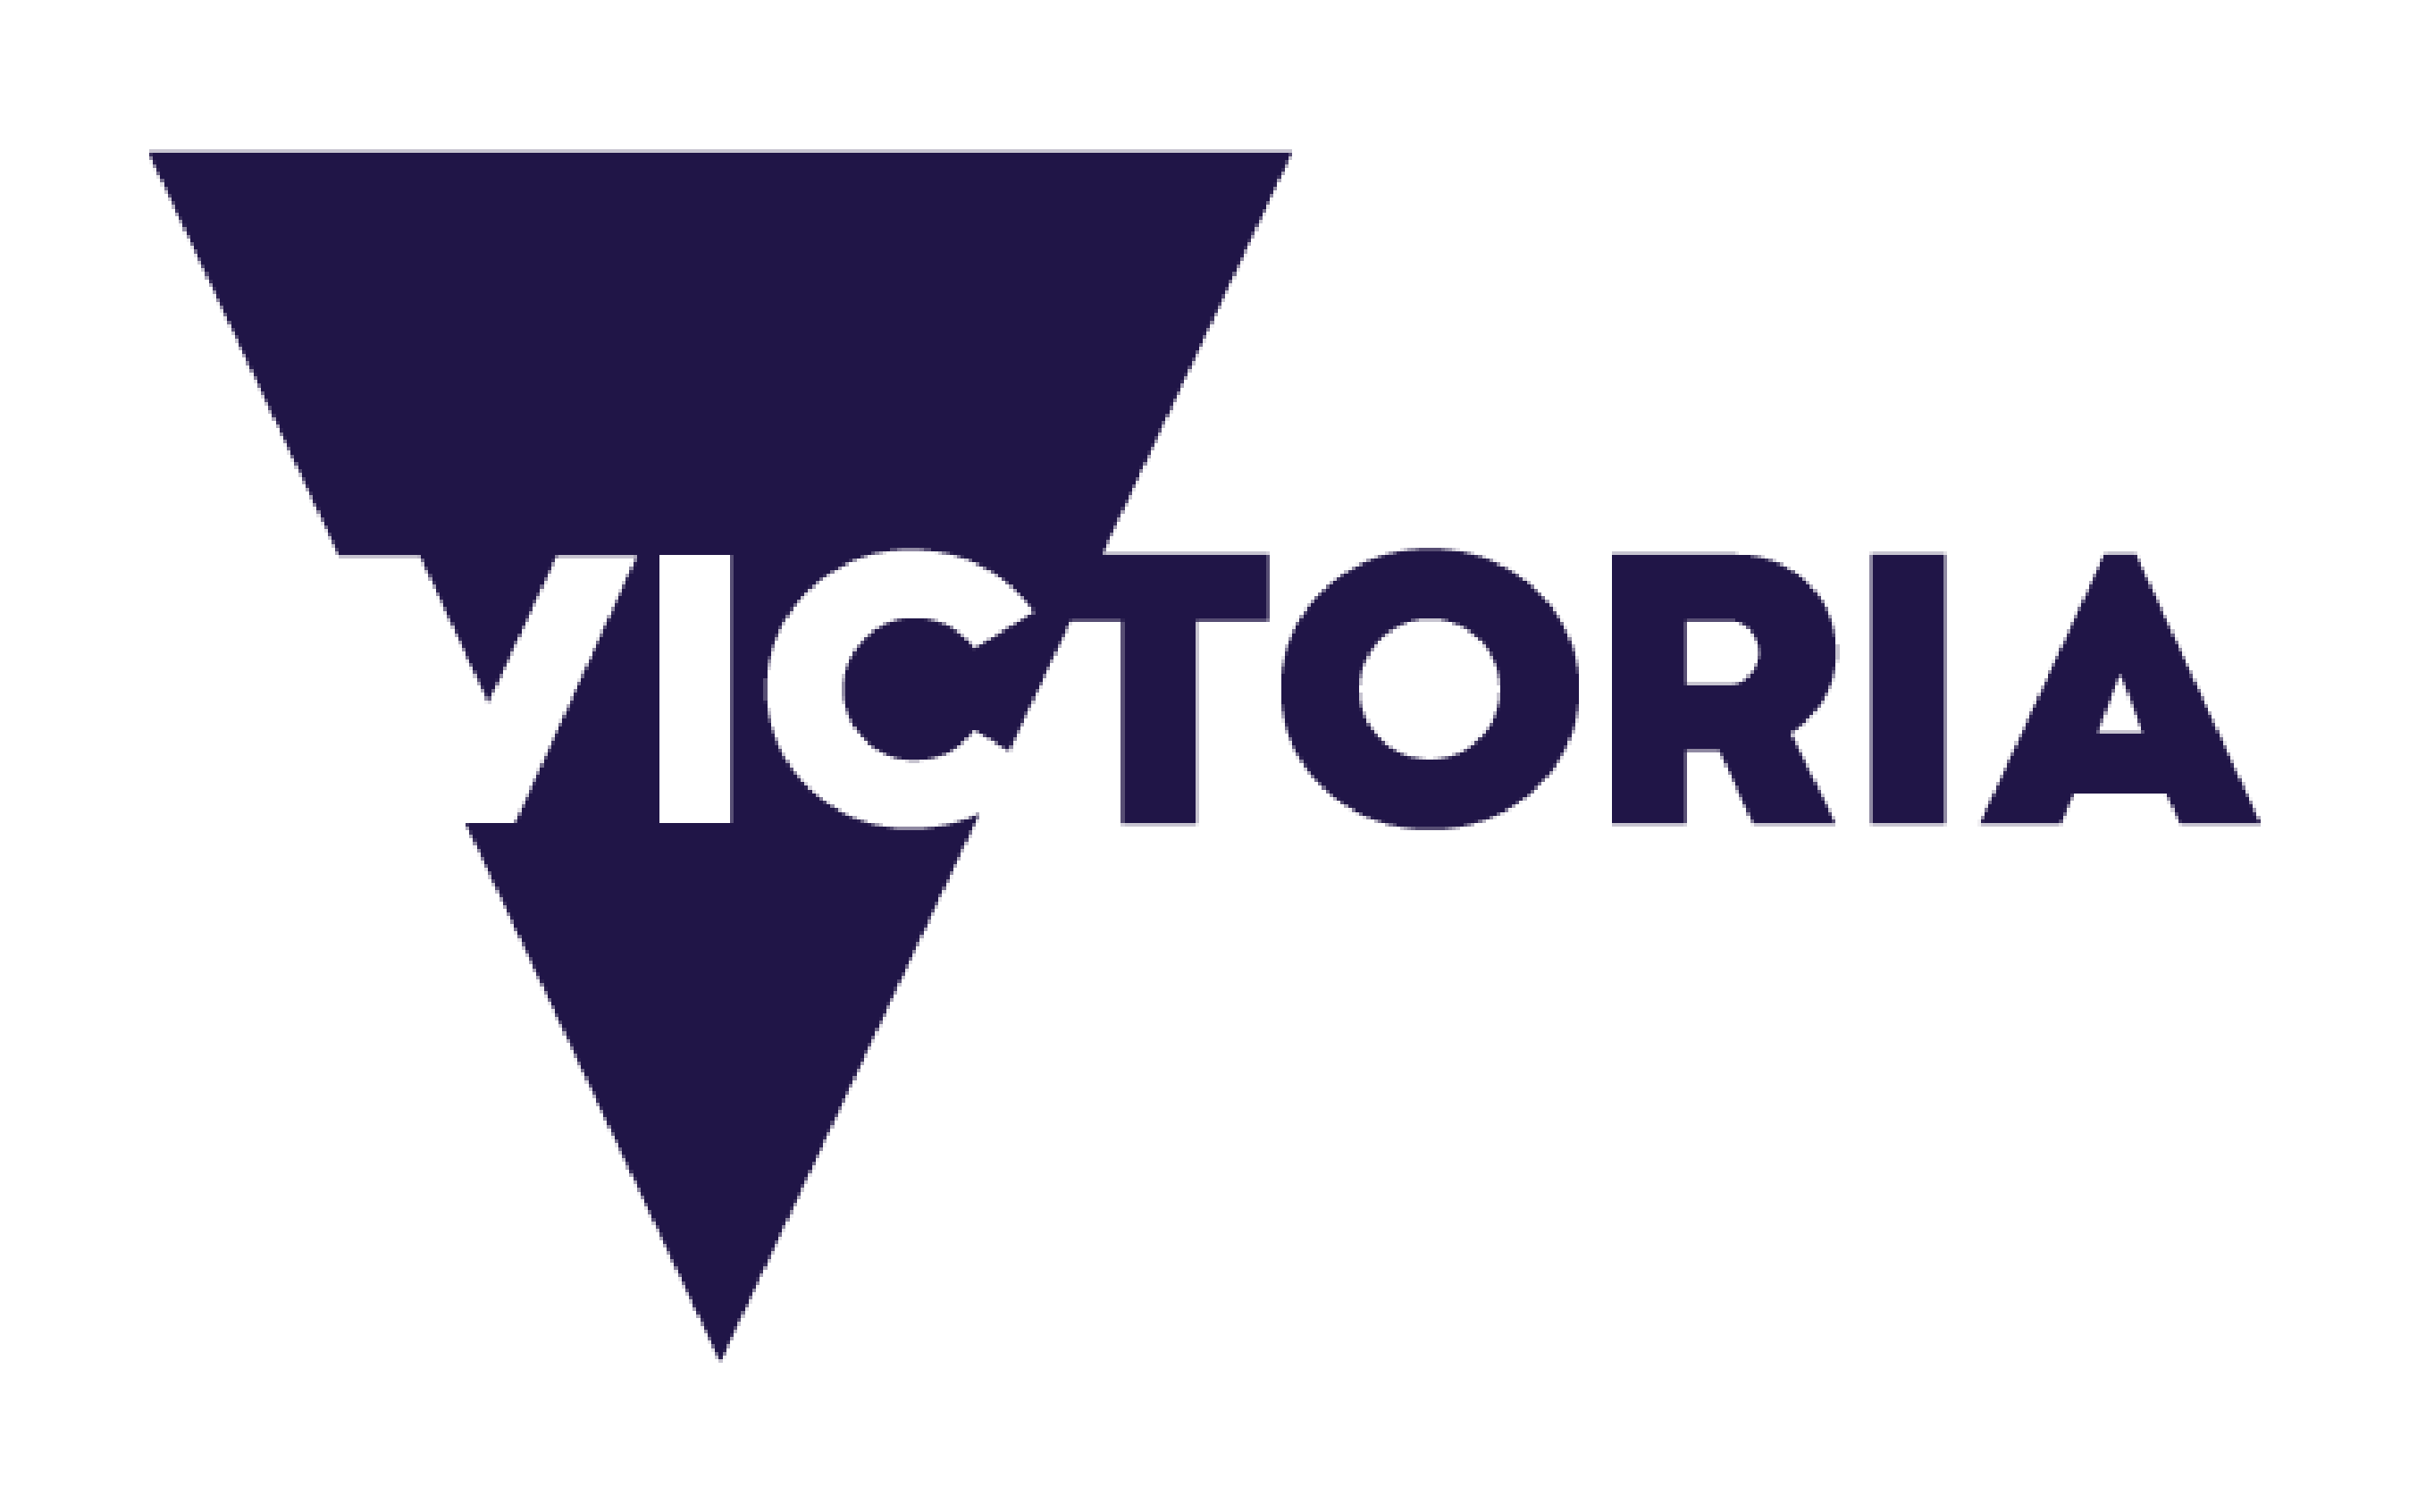 VICTORIA-LOGO-PMS-2765-RGB-01